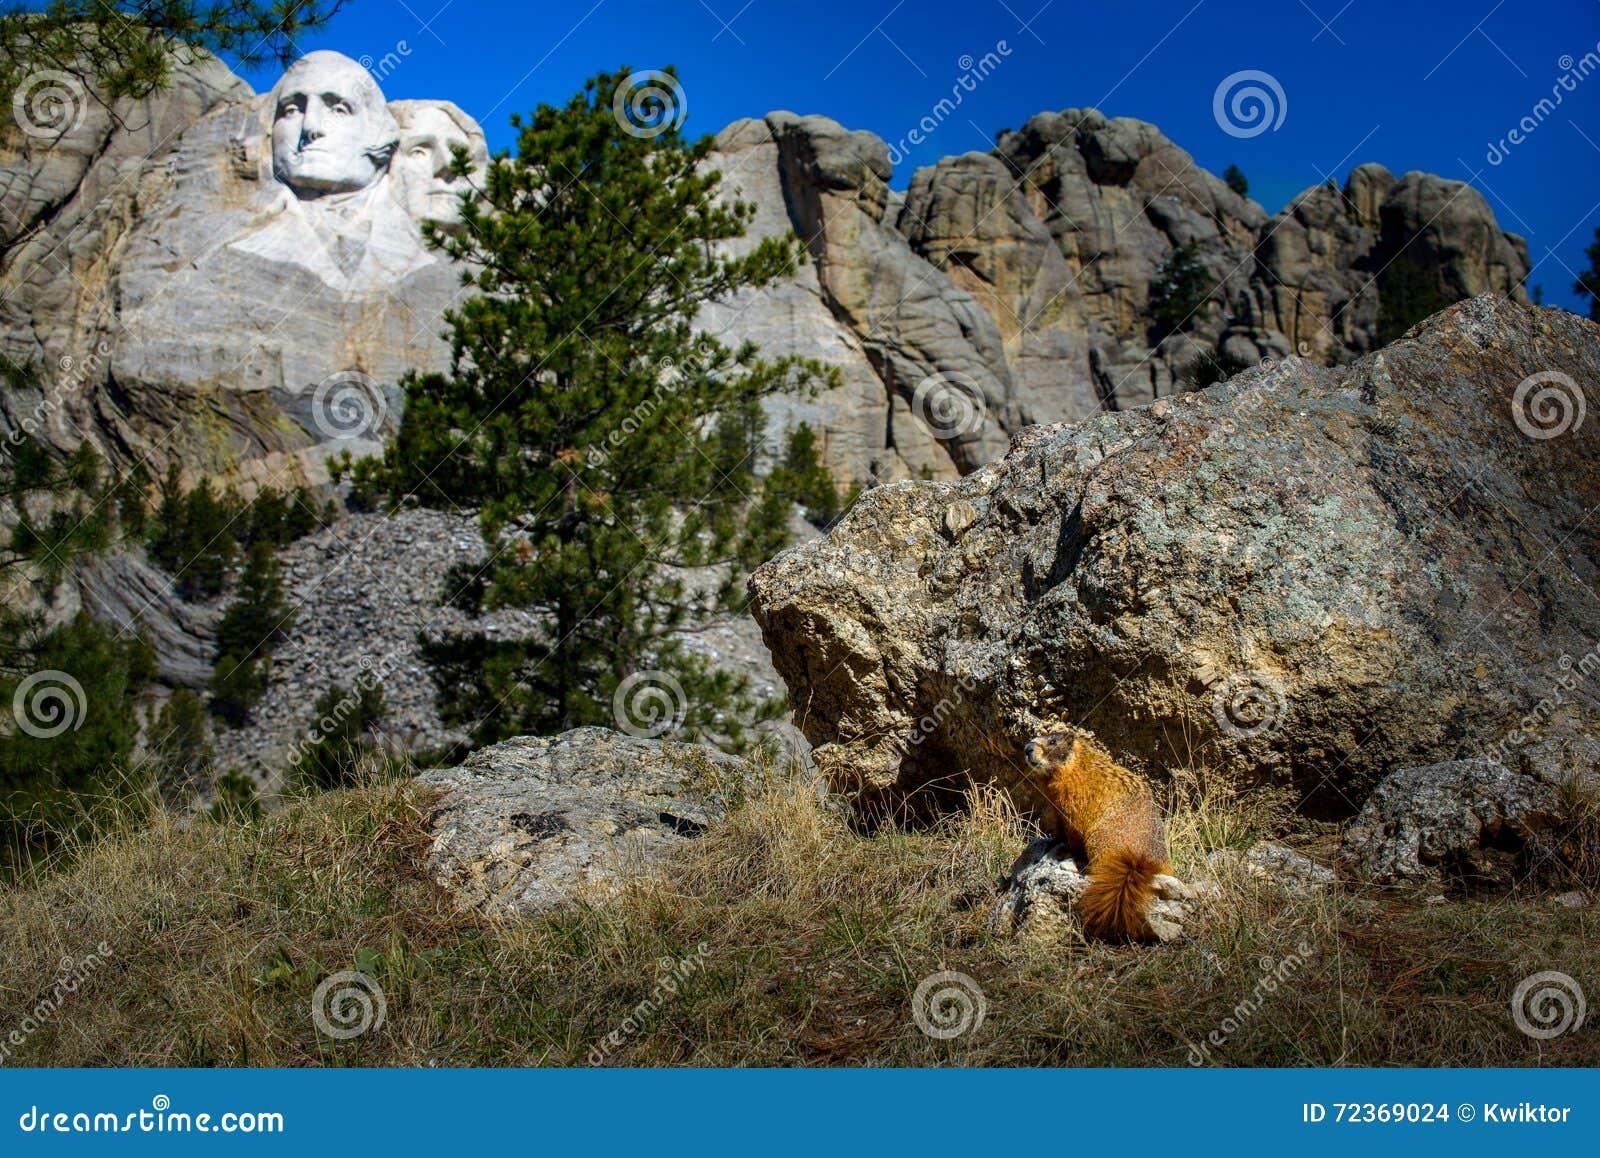 Mt Rushmore土拨鼠